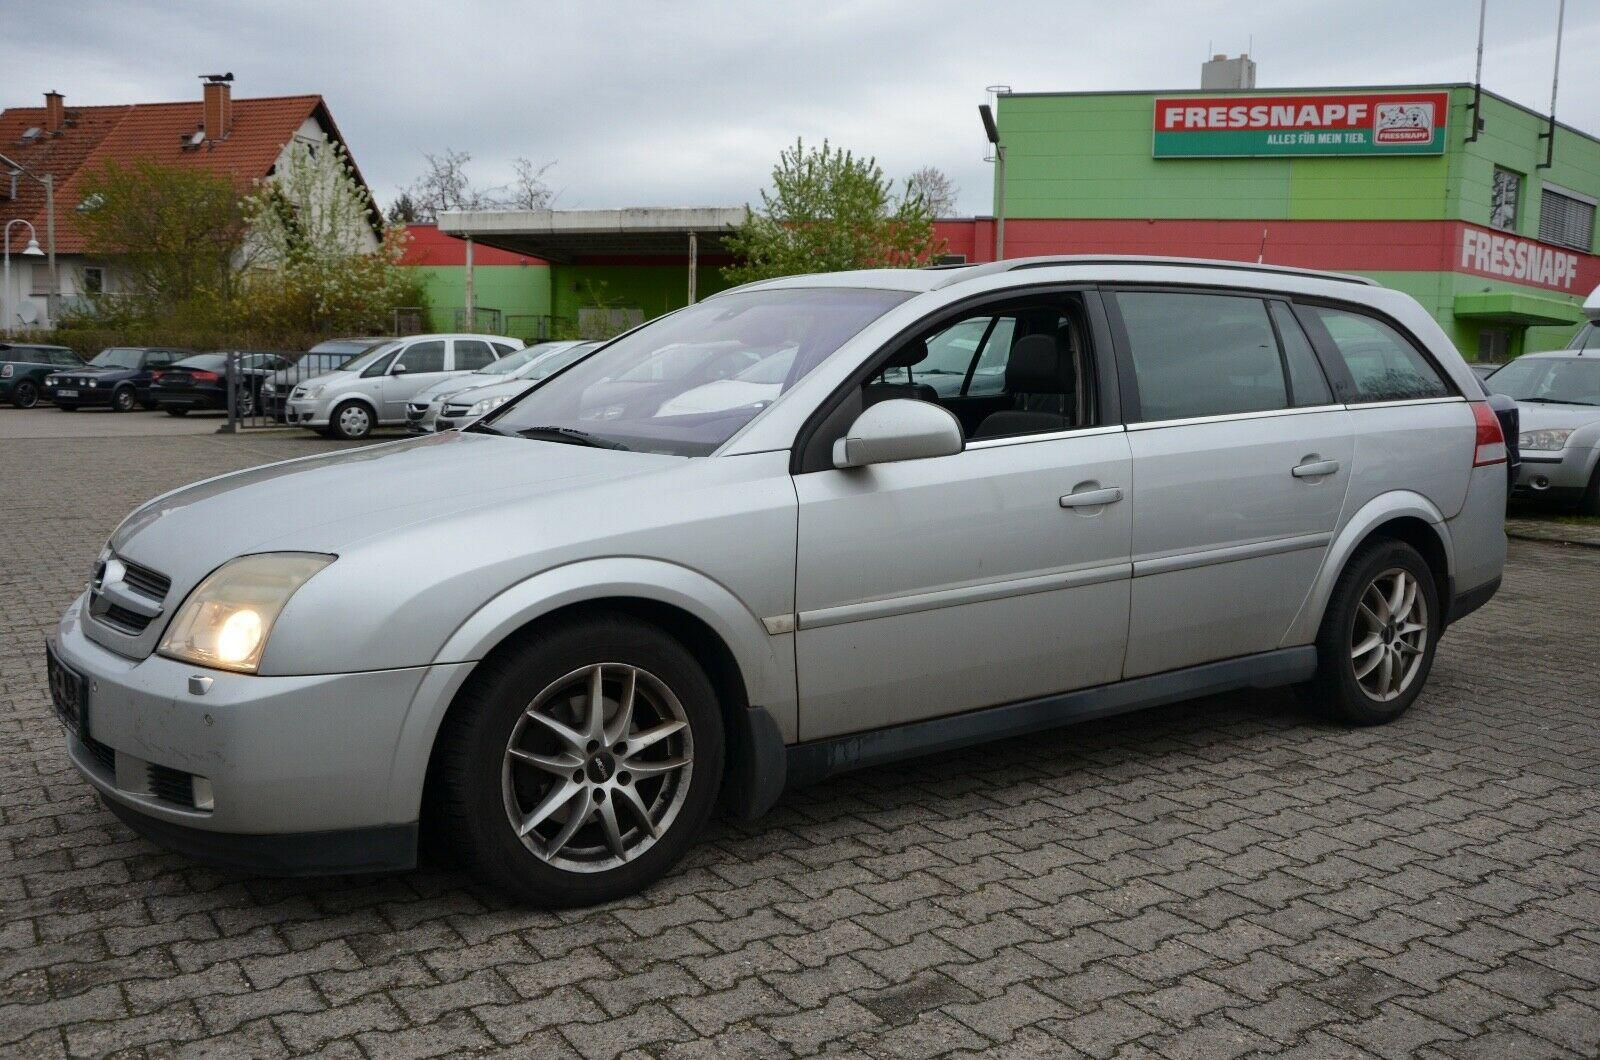 OPEL Vectra C Car Autom ;Leder ESSD